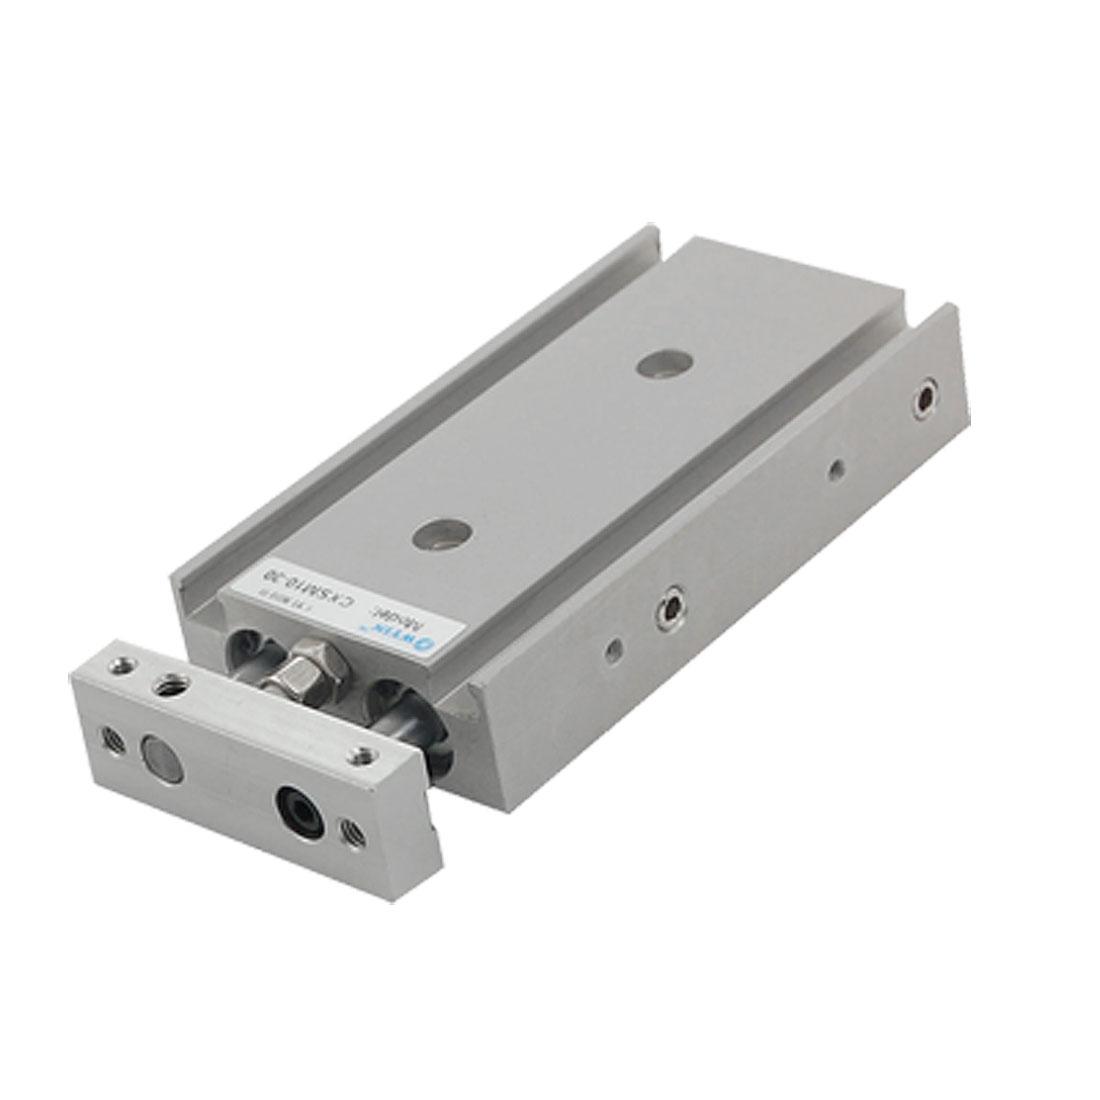 "CXSM10-30 Dual Rod Slide Baring 3/8"" Bore 1 1/5"" Stroke Cylinder"